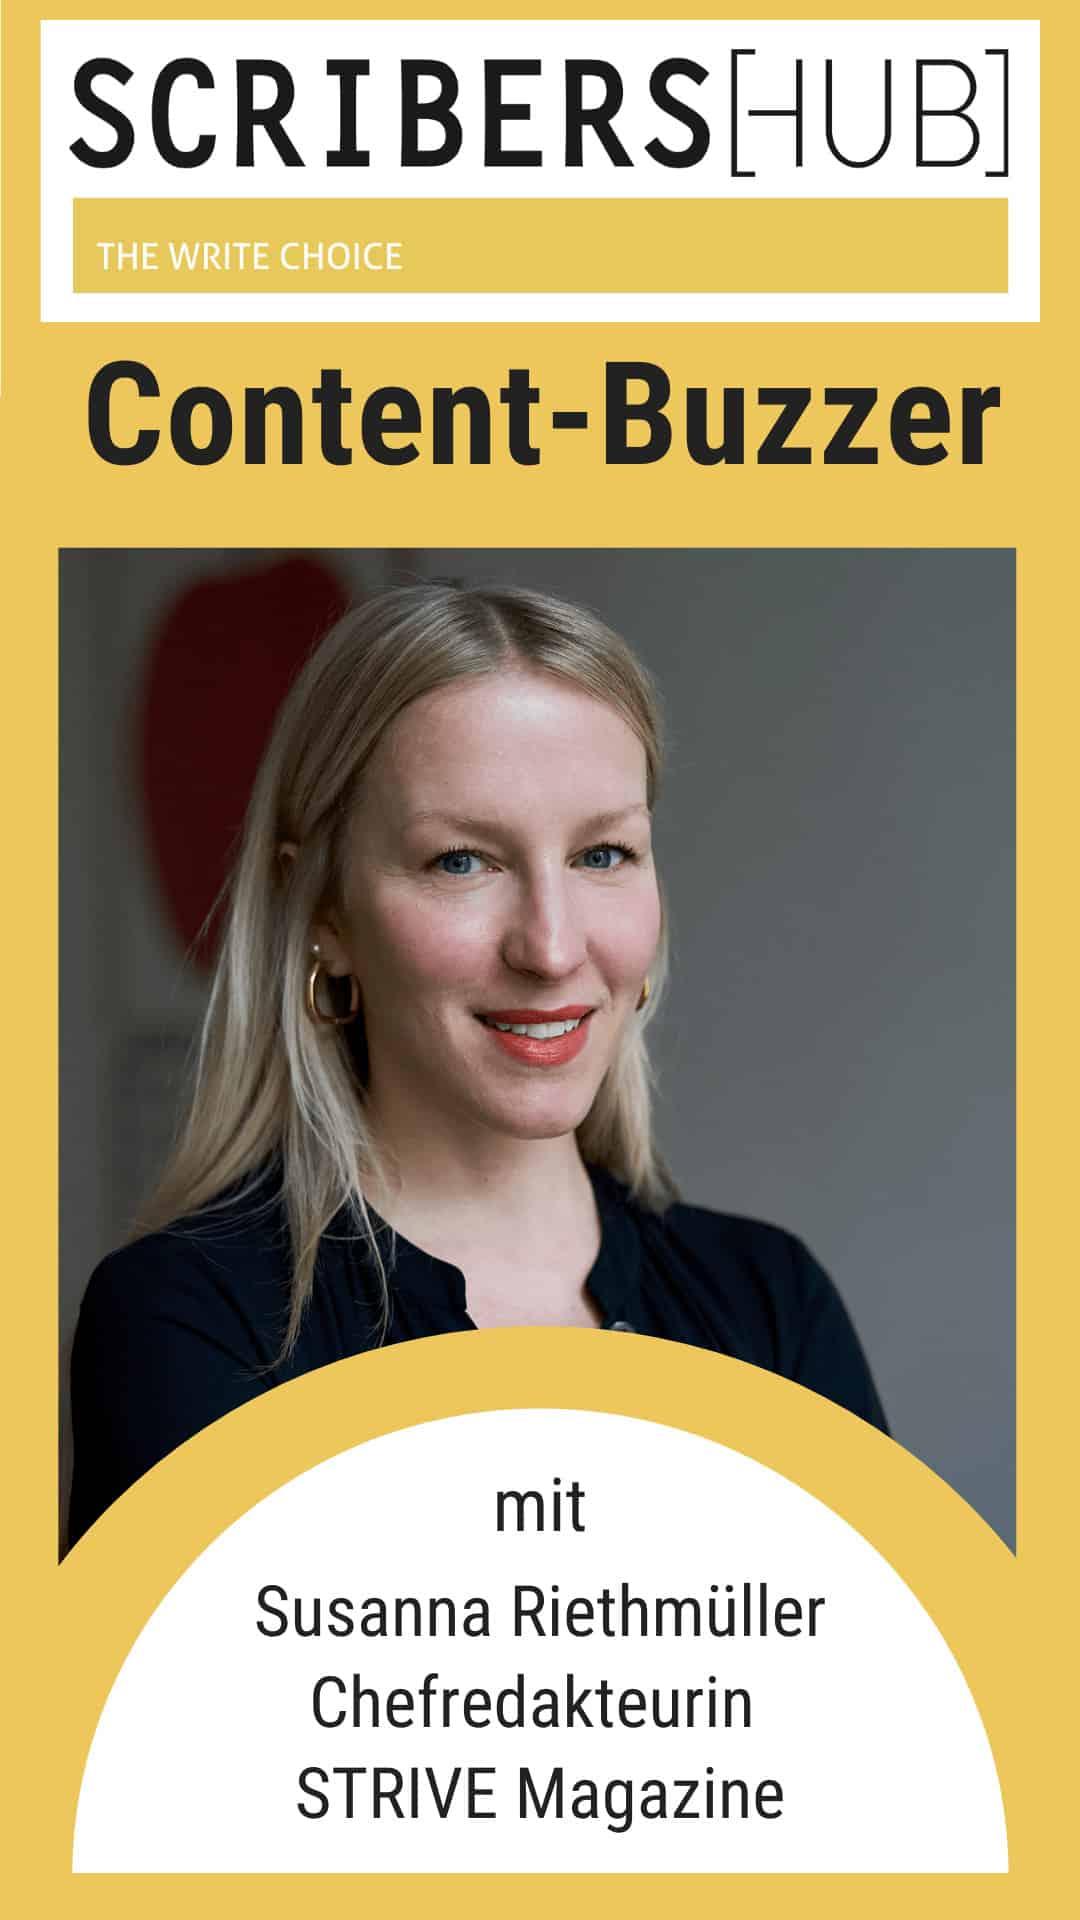 Content Buzzer mit Susanna Riethmüller